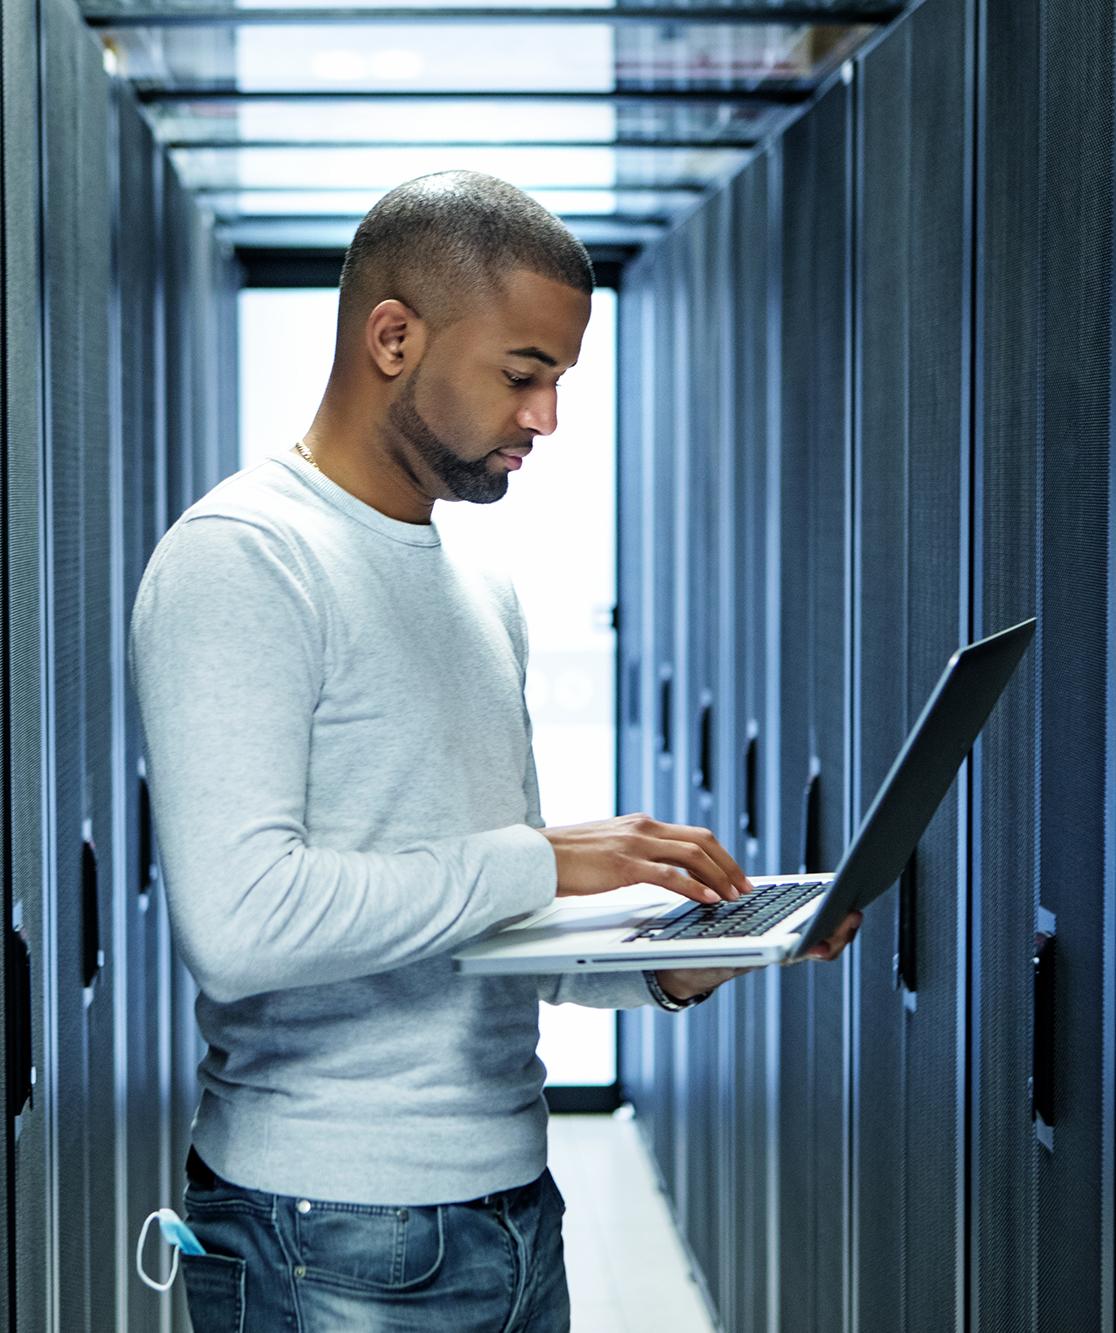 A black male server room technician working